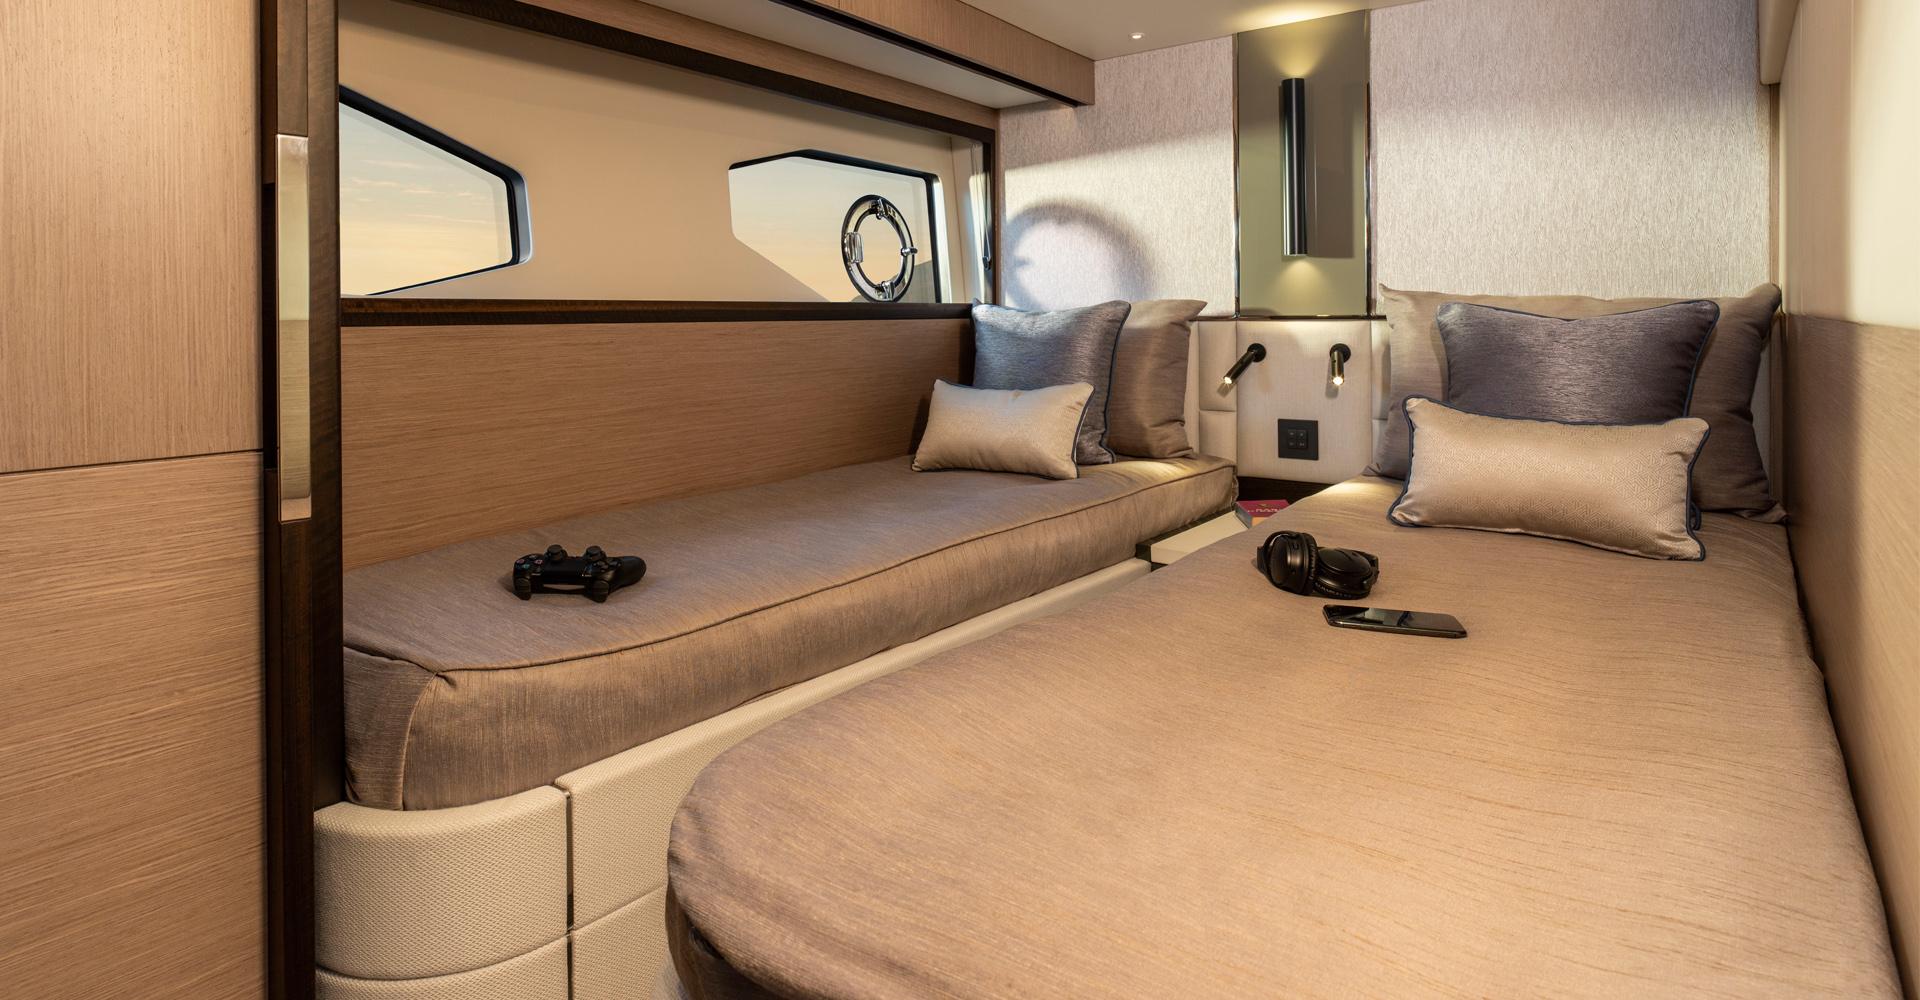 Sunseeker Manhatten 55 twin cabin